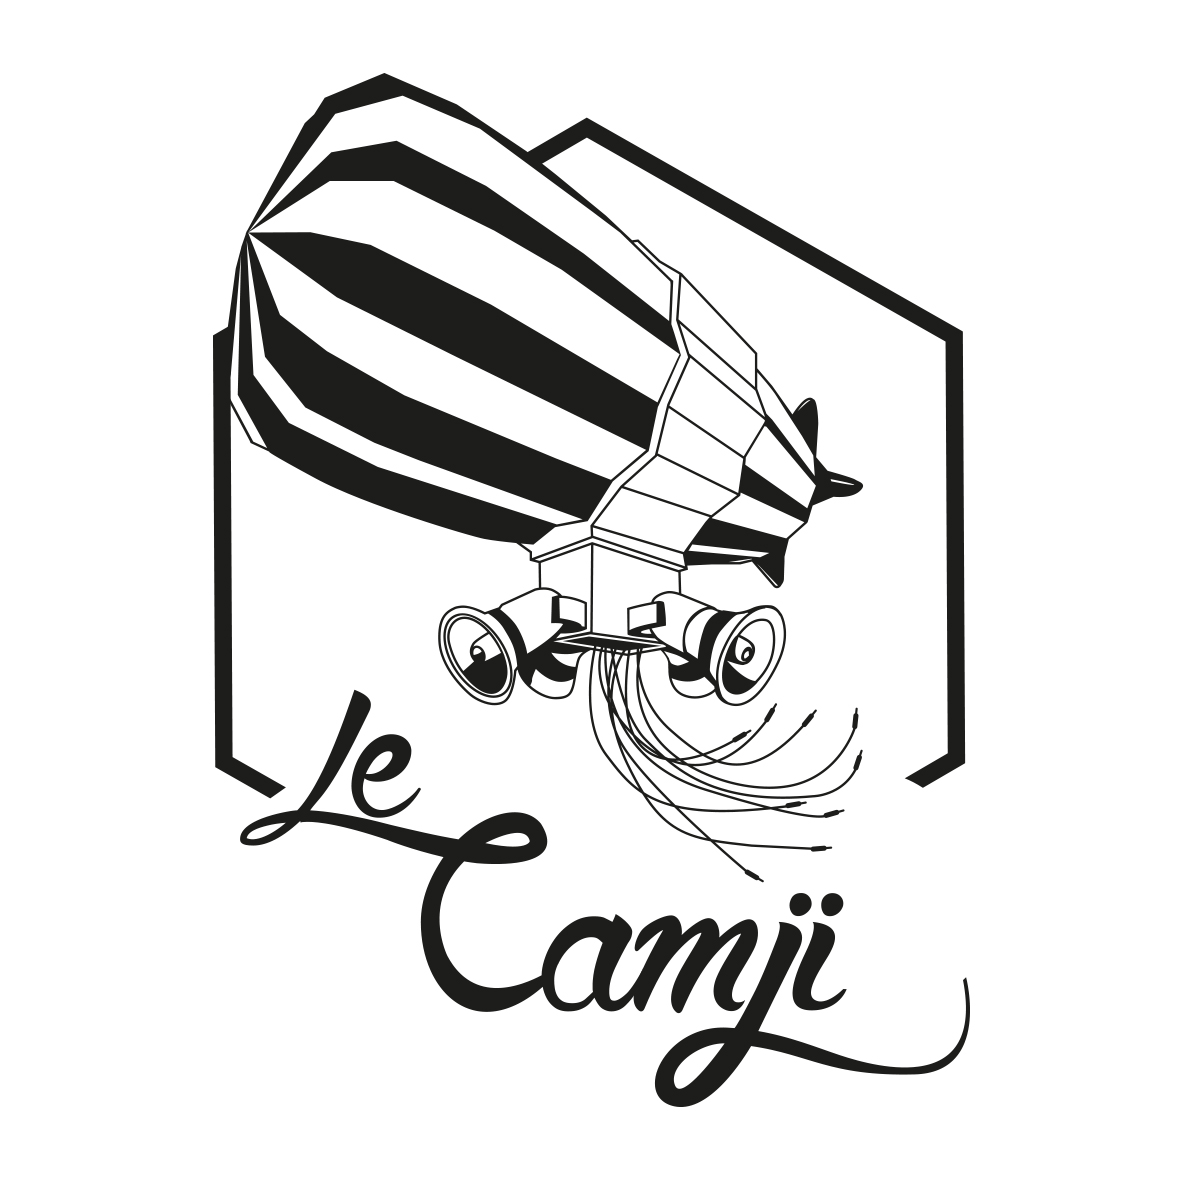 image logo camji